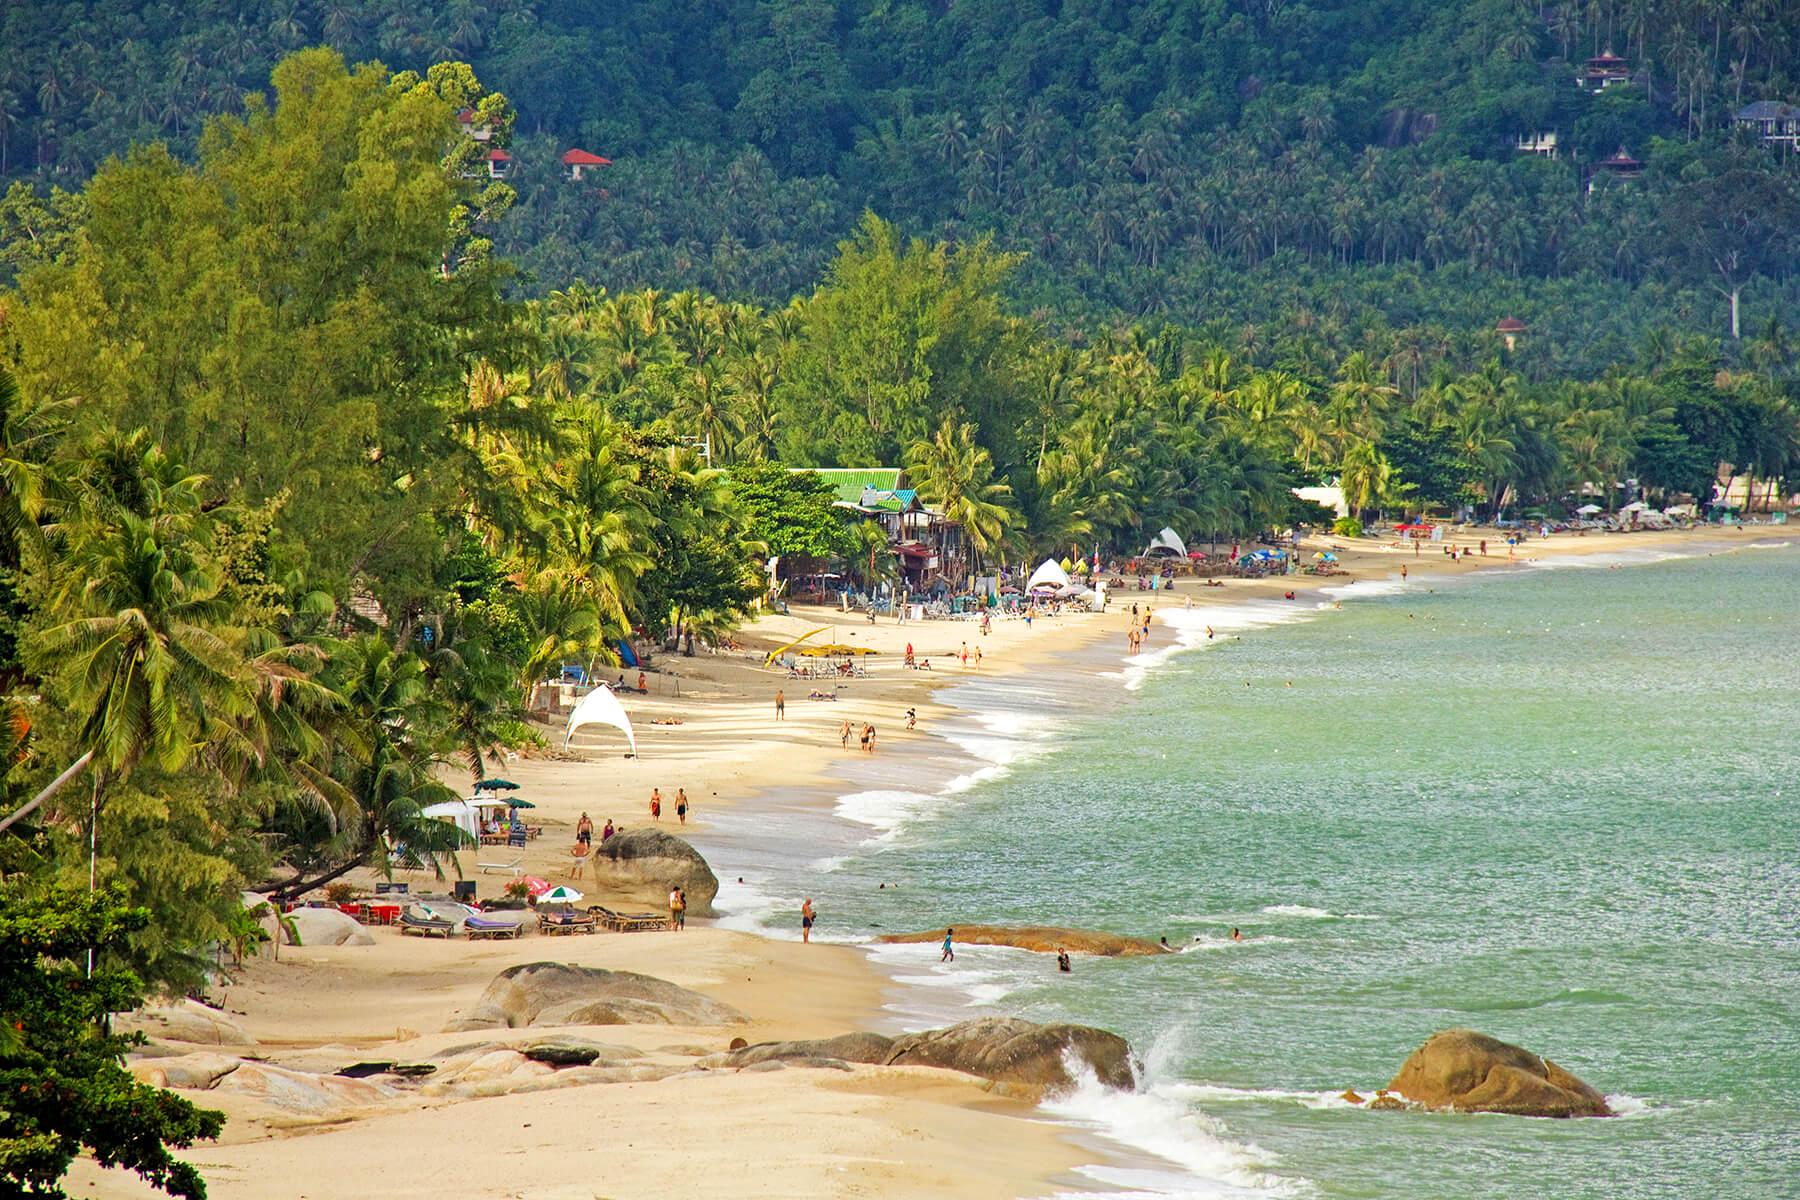 Stranden Op Koh Samui Reistips En